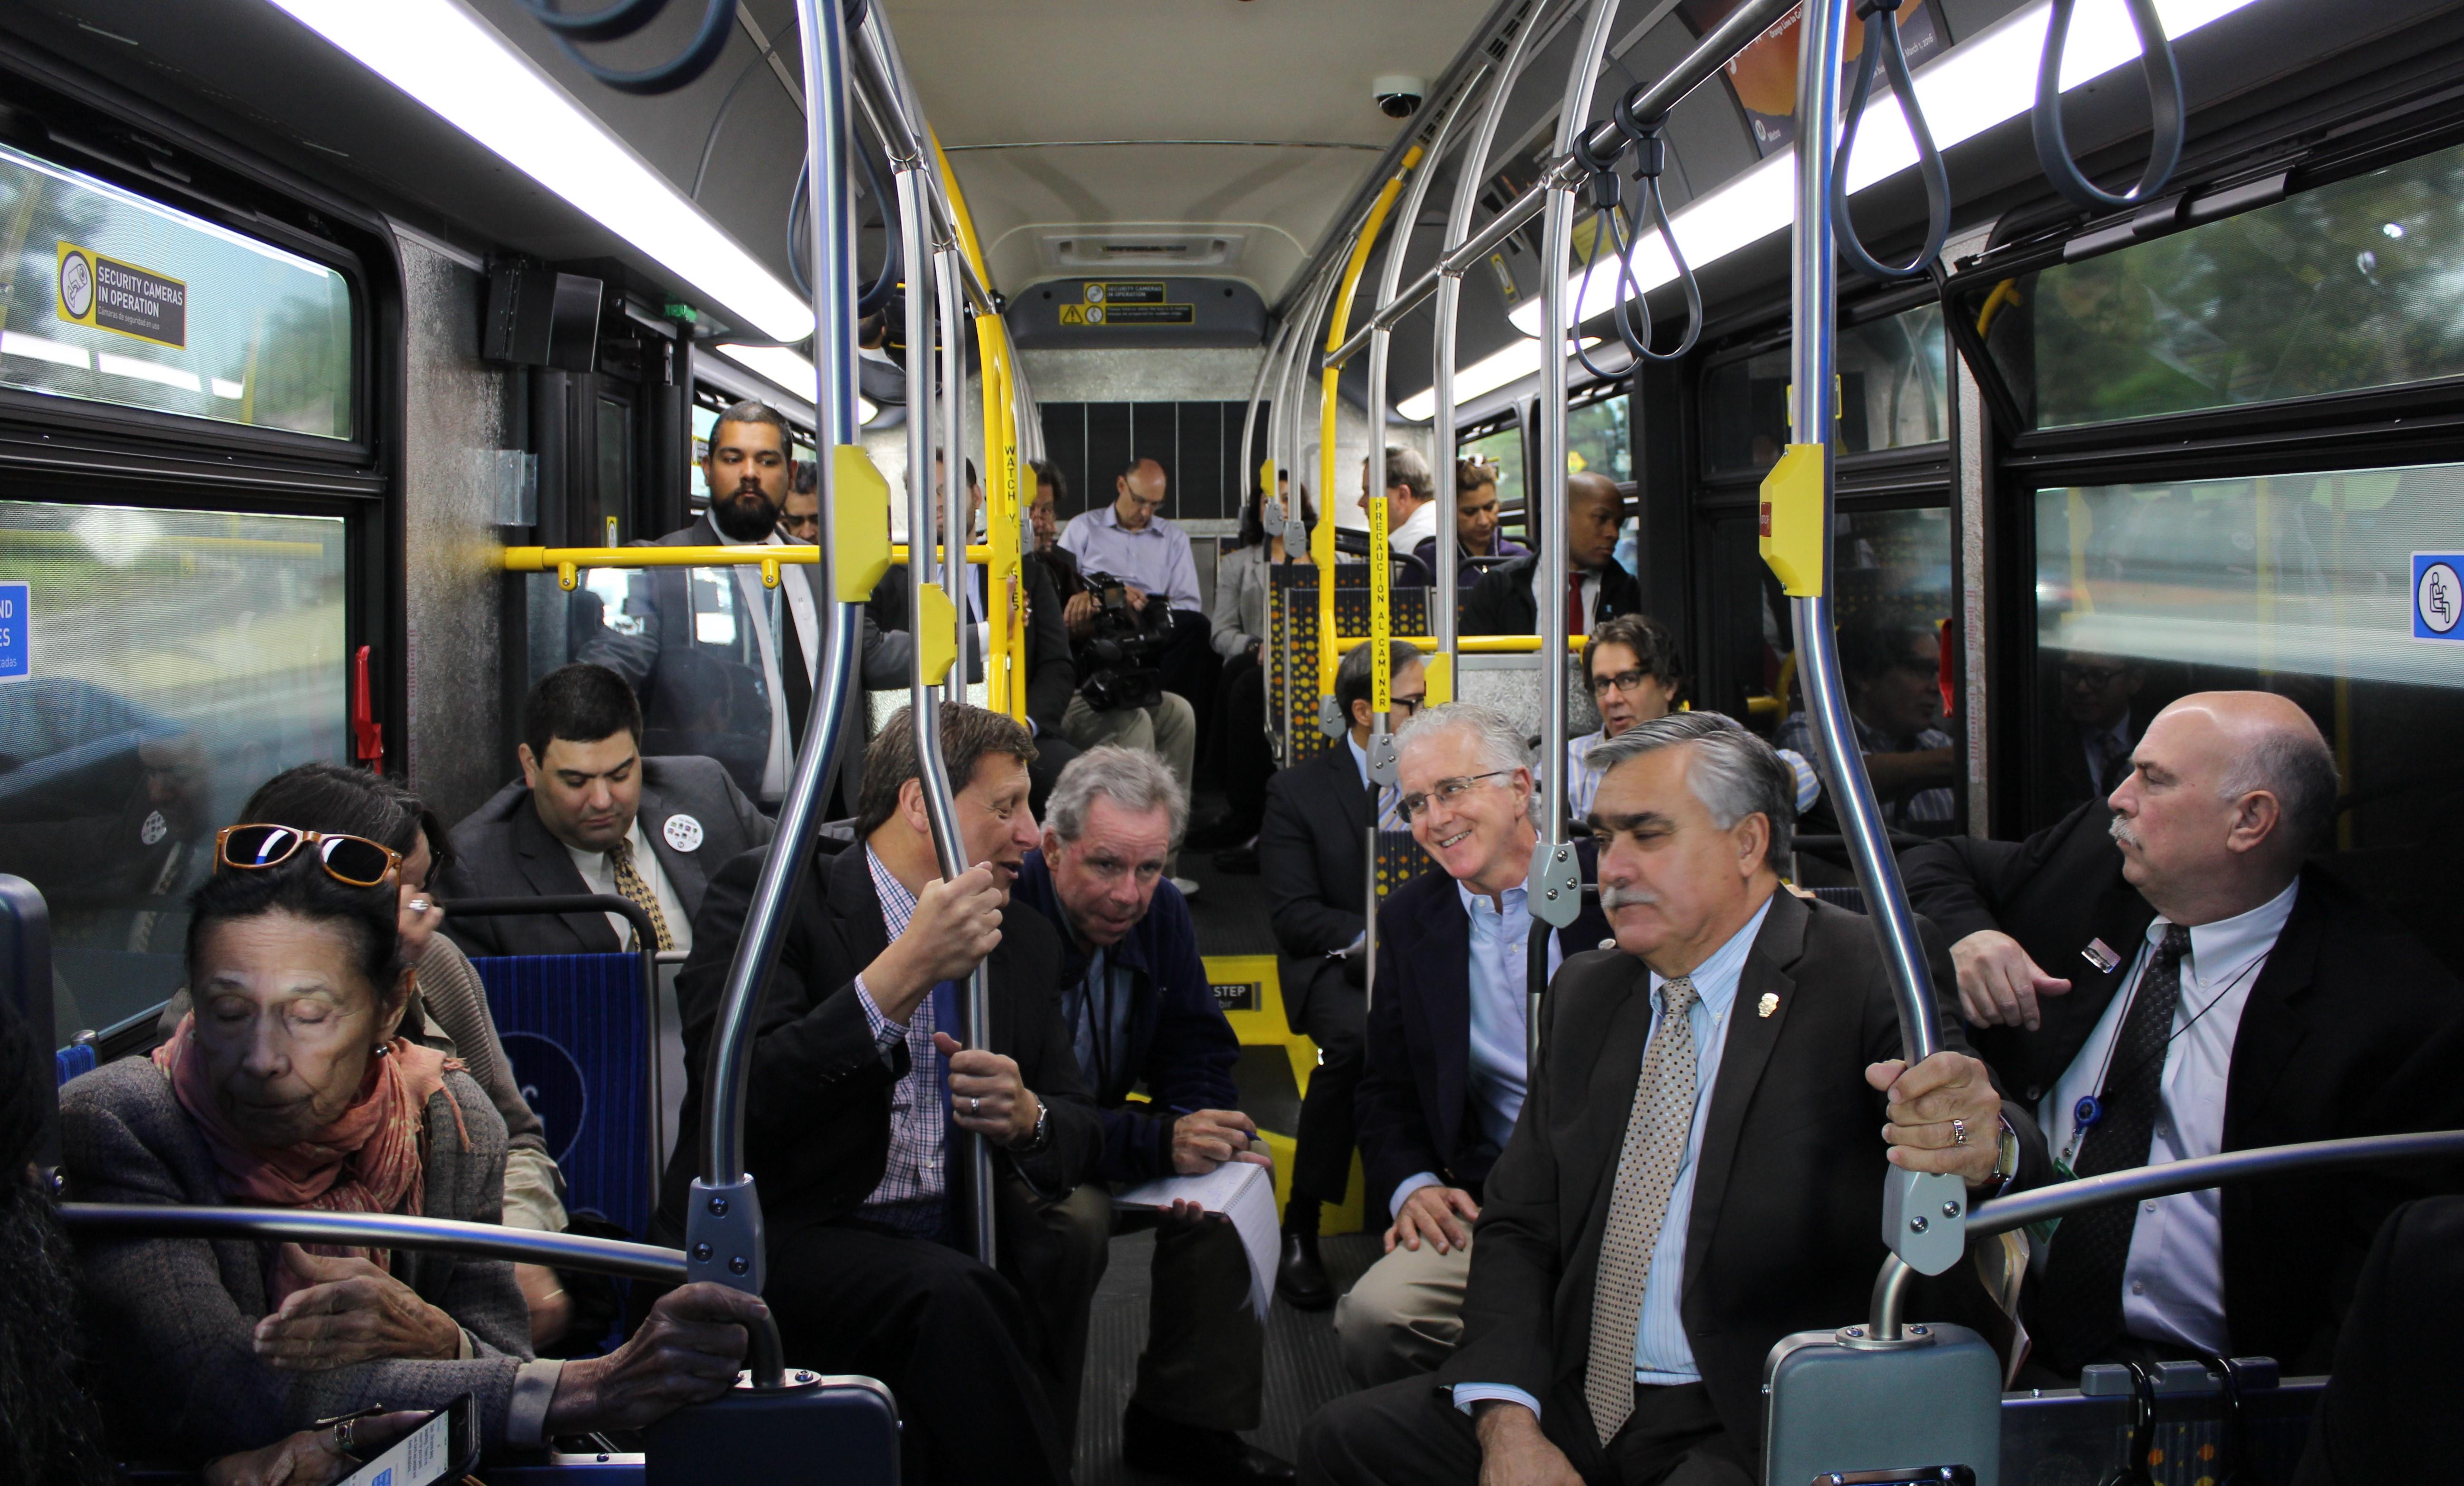 pk_on_501_bus_metro.jpg